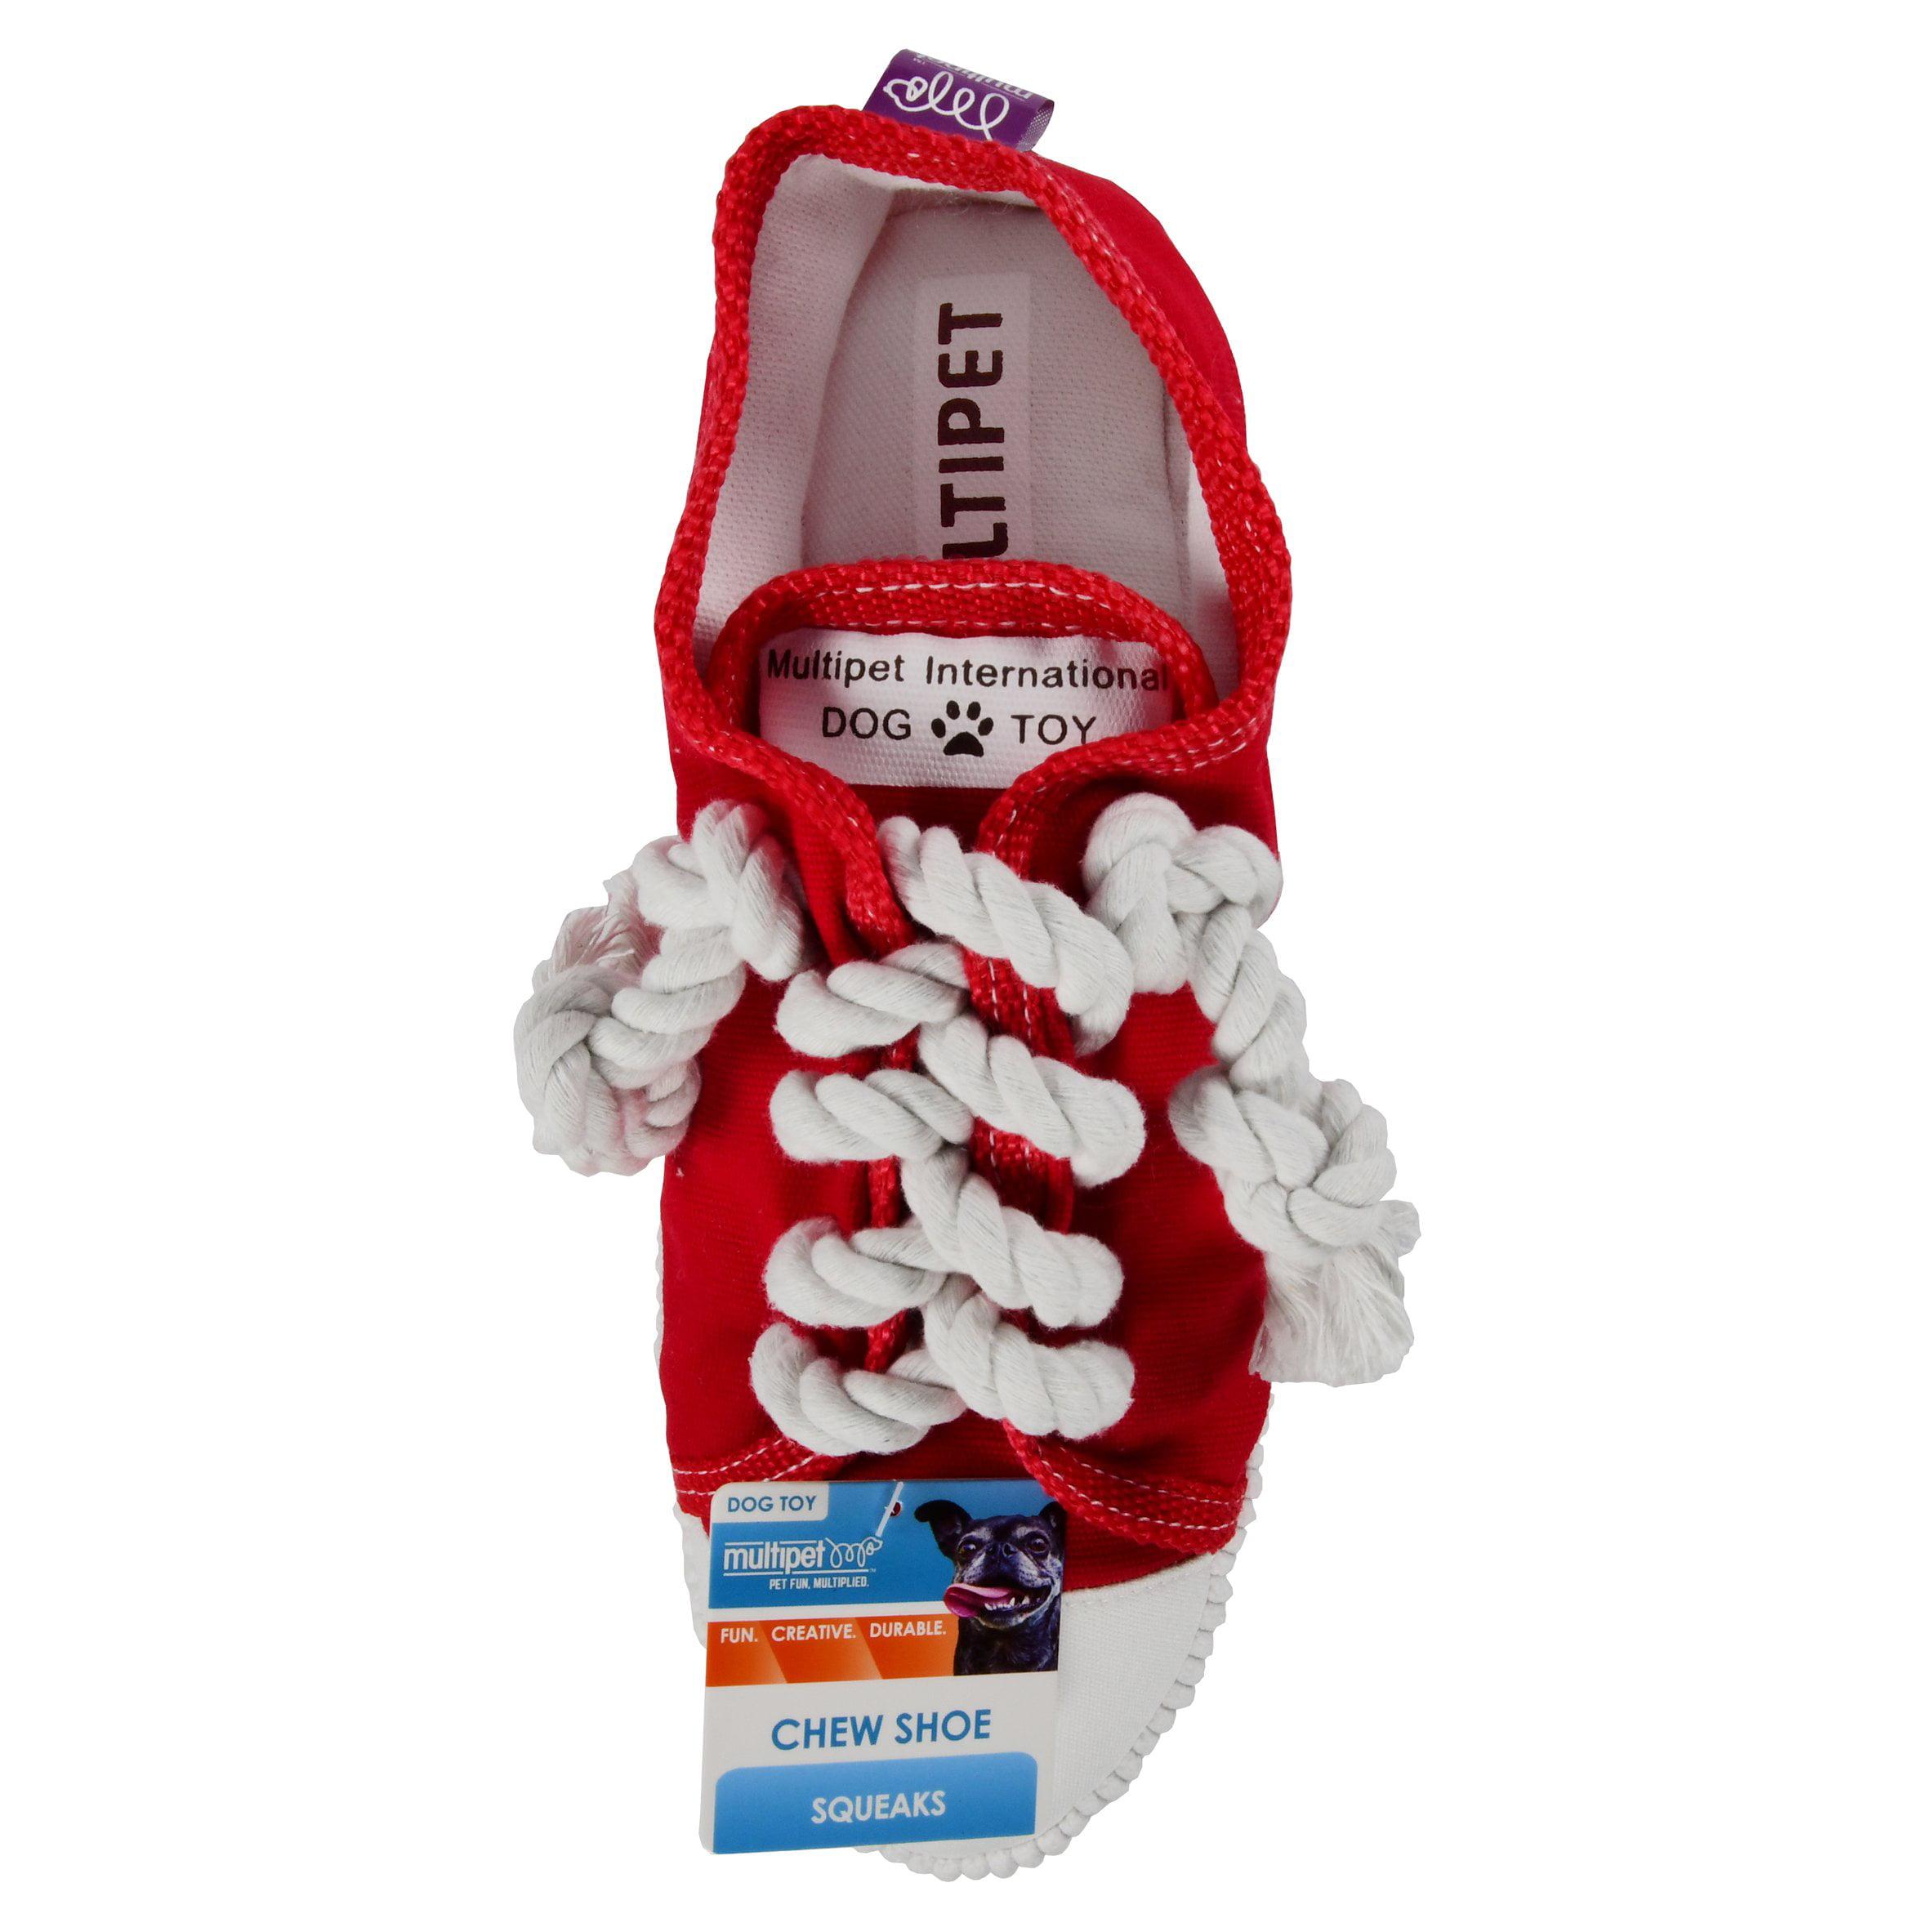 Multipet Chew Shoe Dog Toy